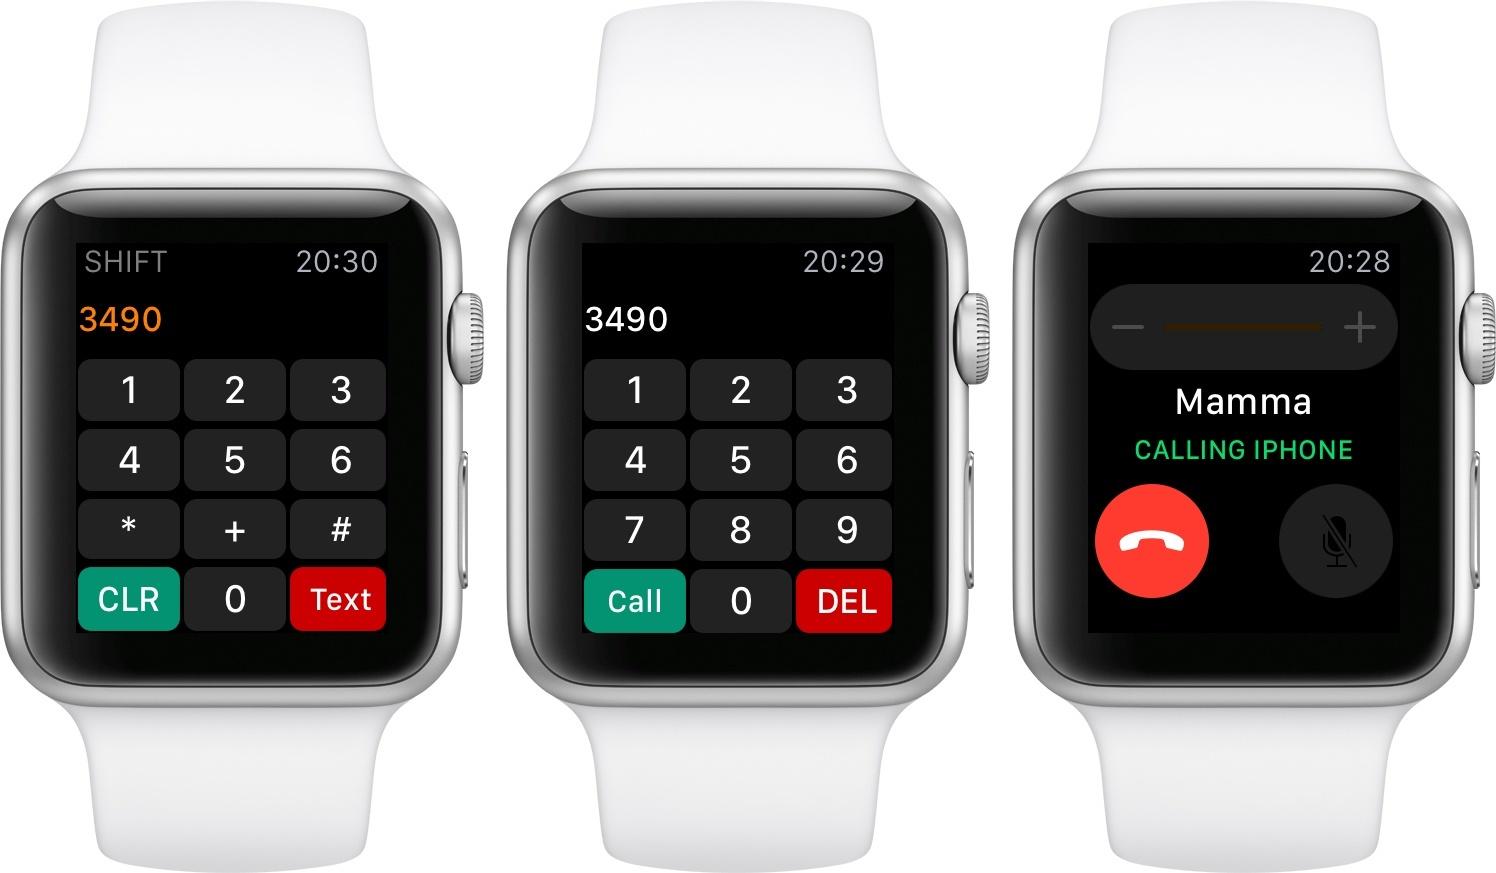 Applewatchcalling